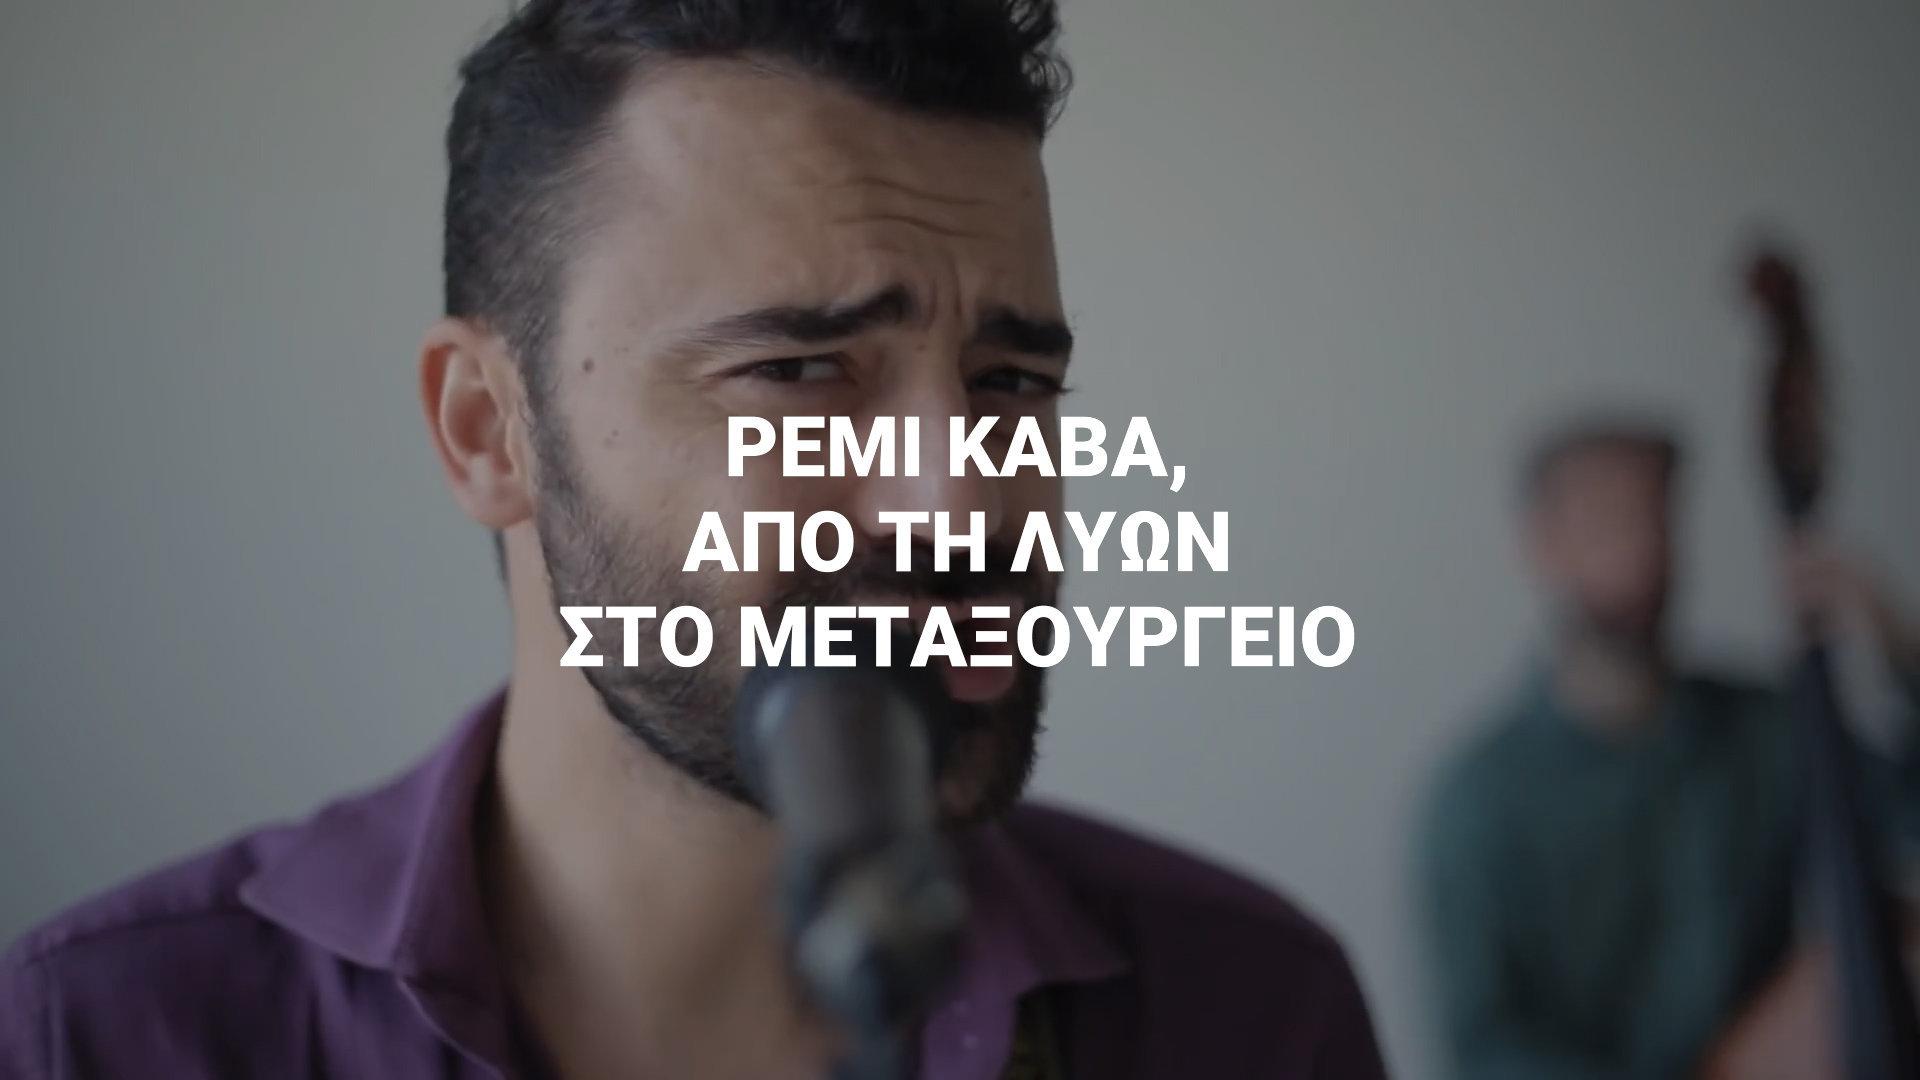 Remi Cavat: «Προσπαθώ να βγάλω αυτό το ελληνικό πάθος στα τραγούδια μου, αλλά είμαι ακόμα πολύ